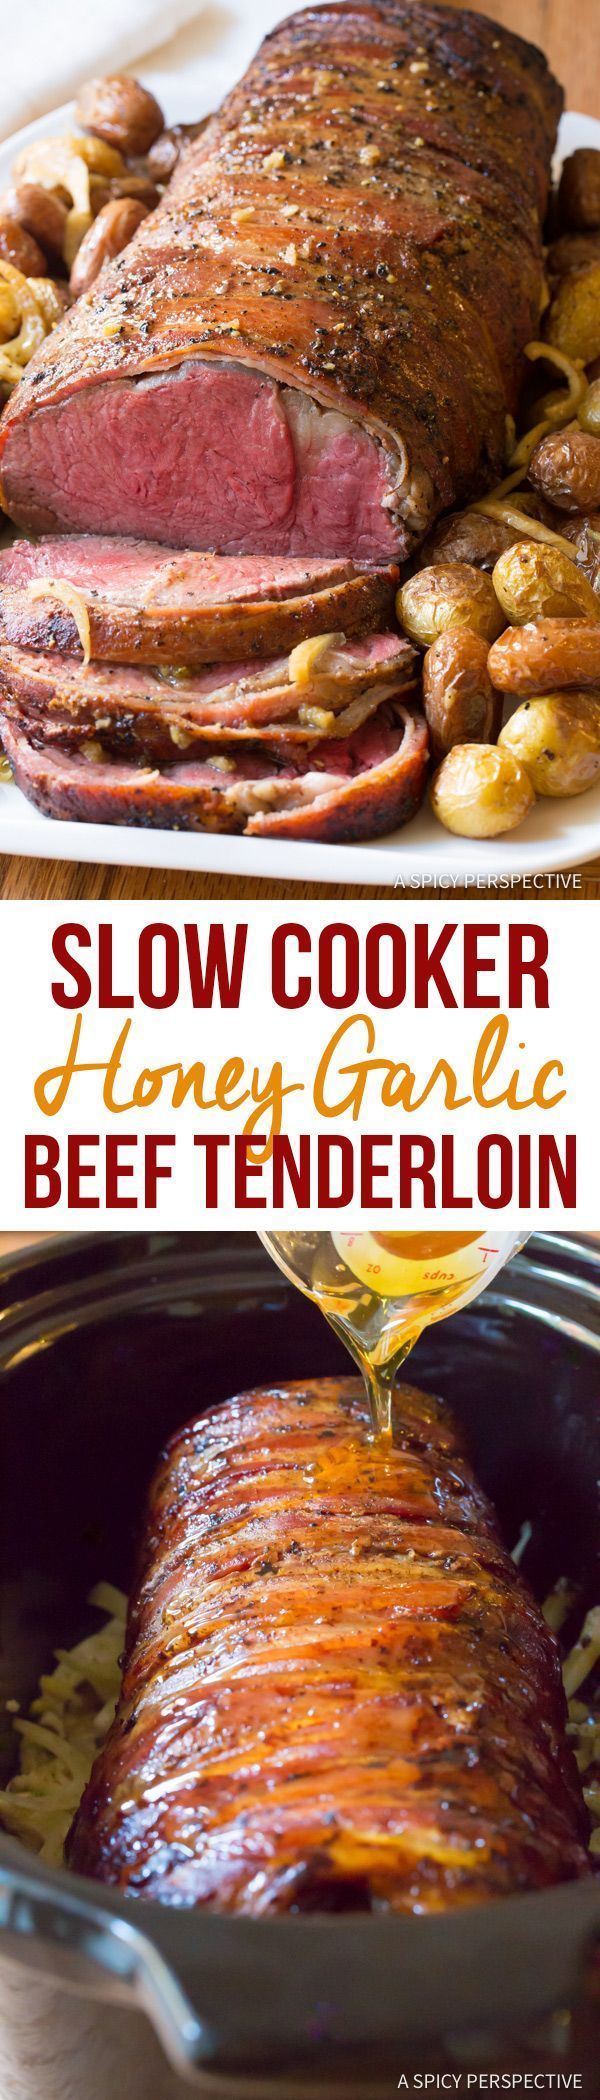 Fabulous Slow Cooker Honey Garlic Beef Tenderloin Recipe | ASpicyPerspective.com #holiday #christmas #crockpot